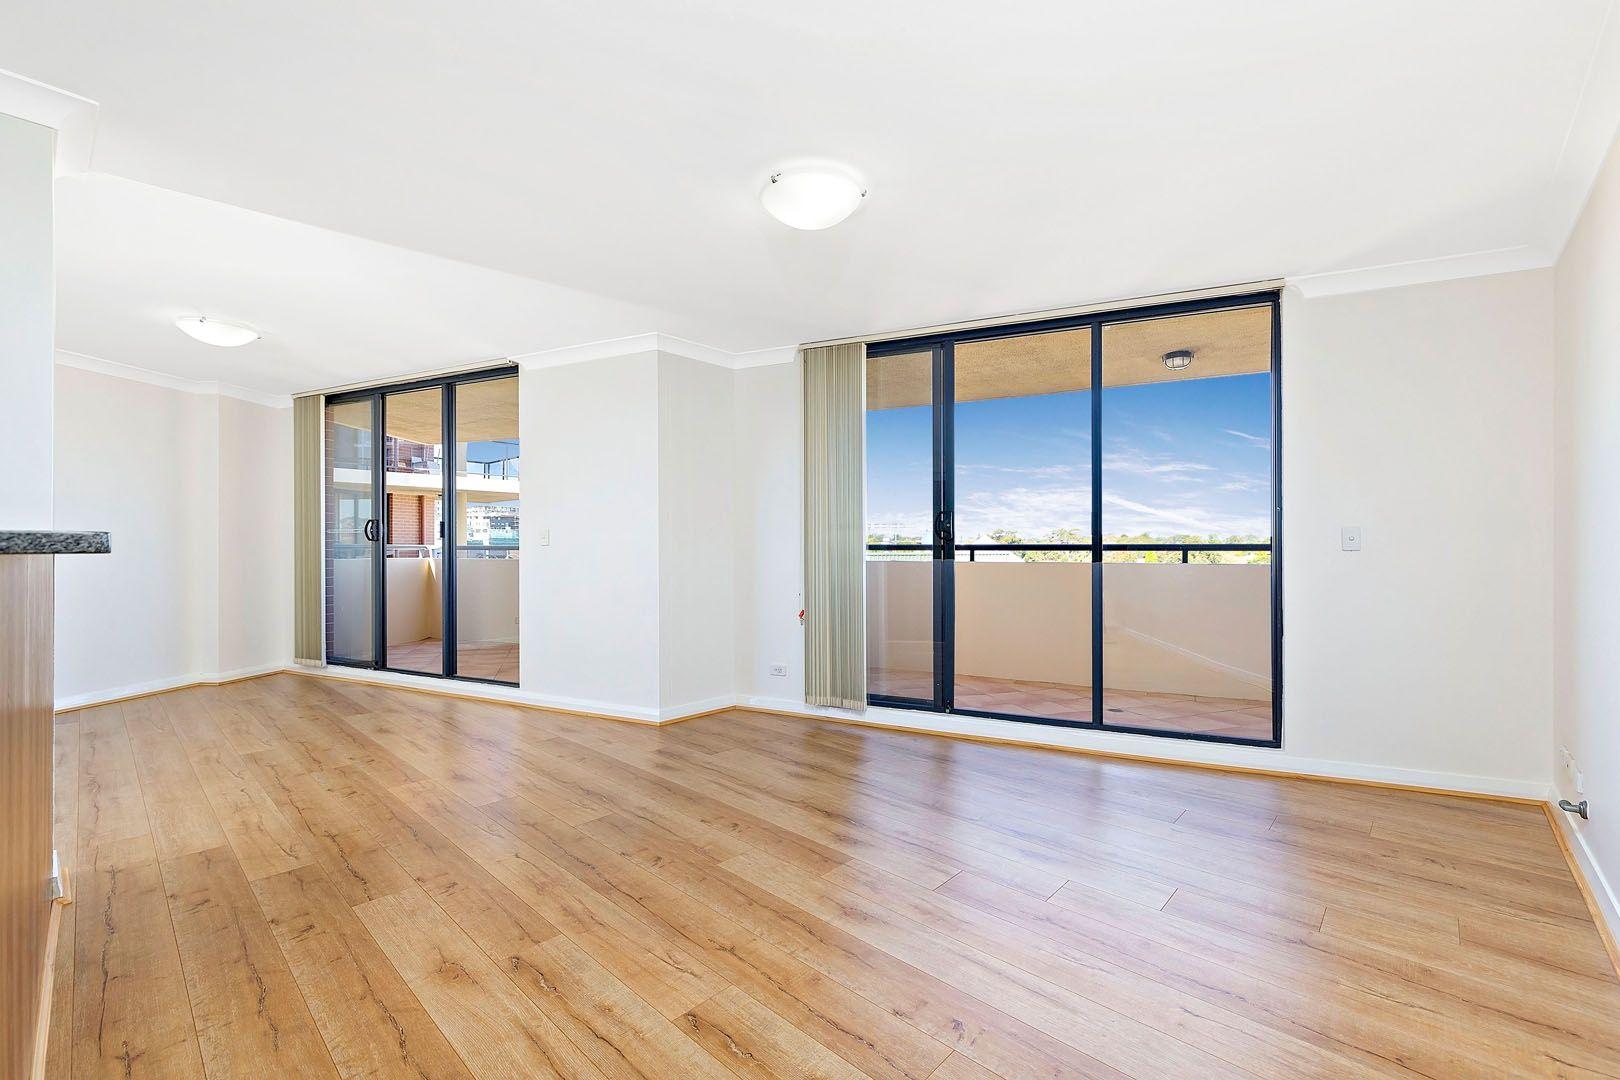 165/1-3 Beresford Road, Strathfield NSW 2135, Image 1